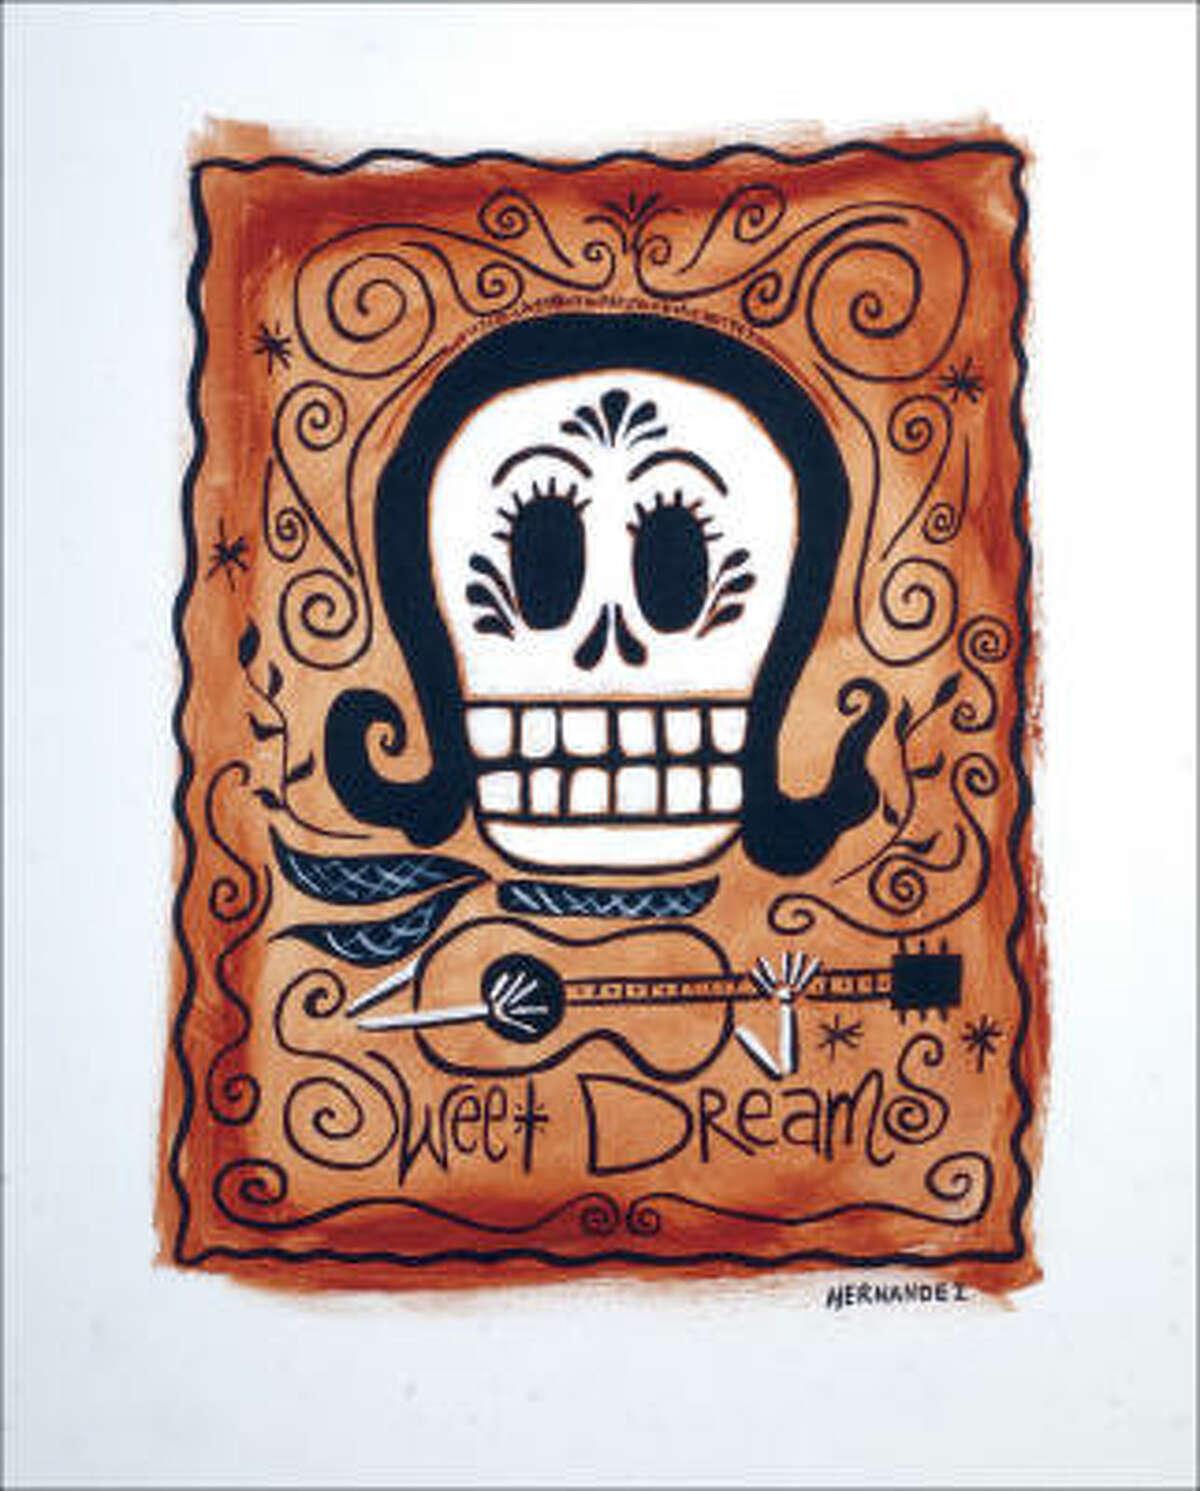 La Senora Patsy Cline by Carlos Hernandez is in the Day of the Dead Rock Stars exhibit.